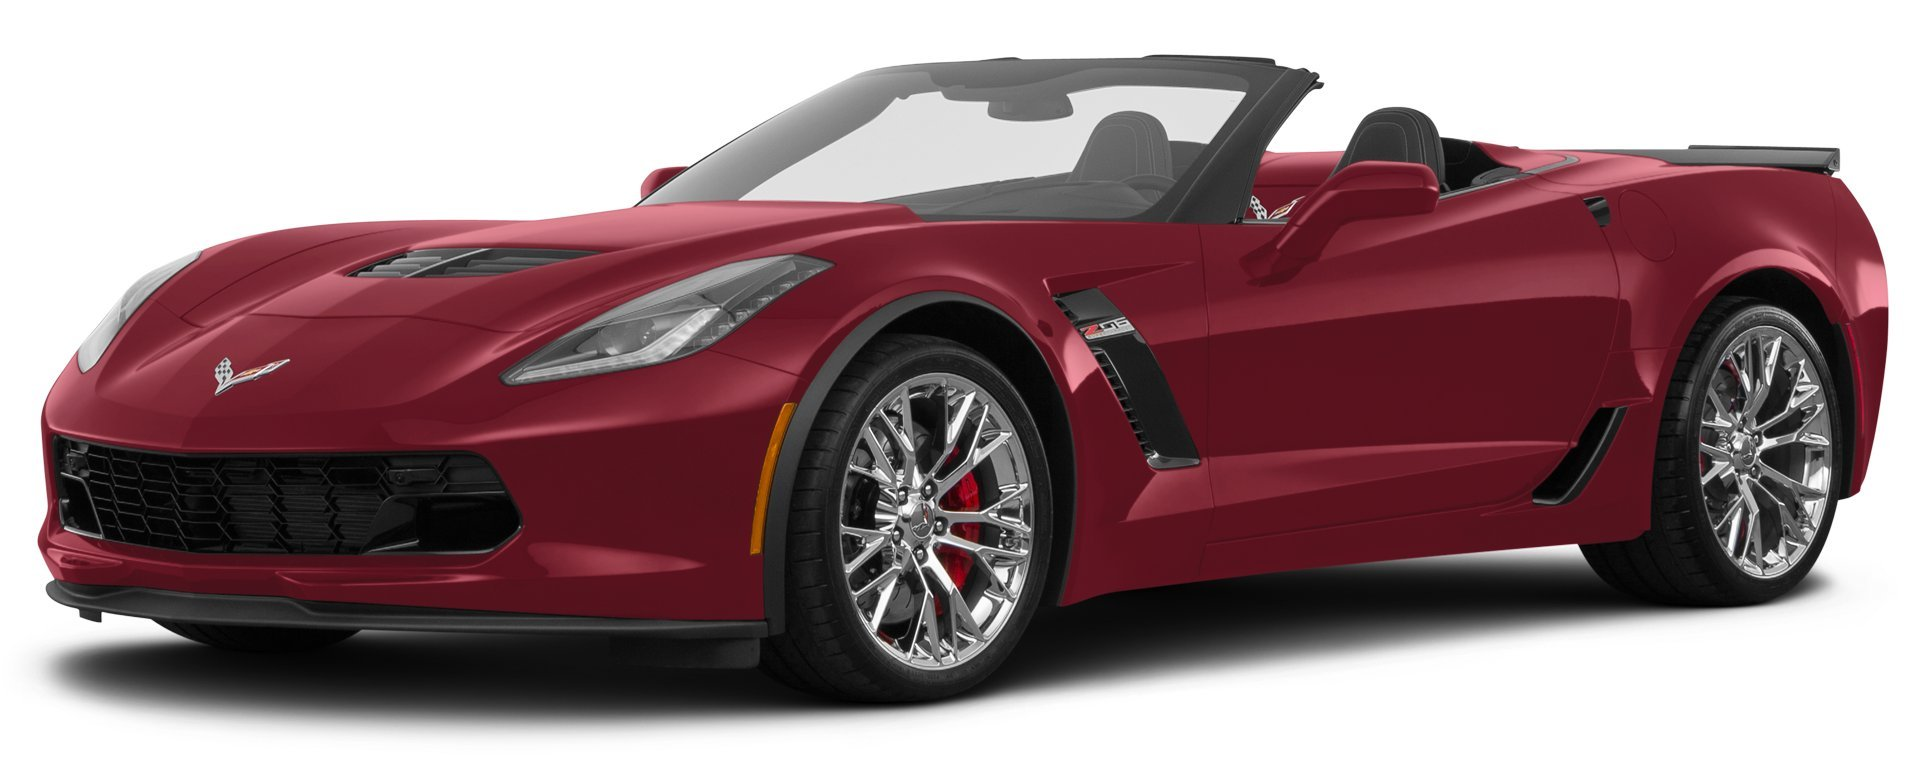 dodge viper convertible 1lz z06 corvette chevrolet door amazon coupe